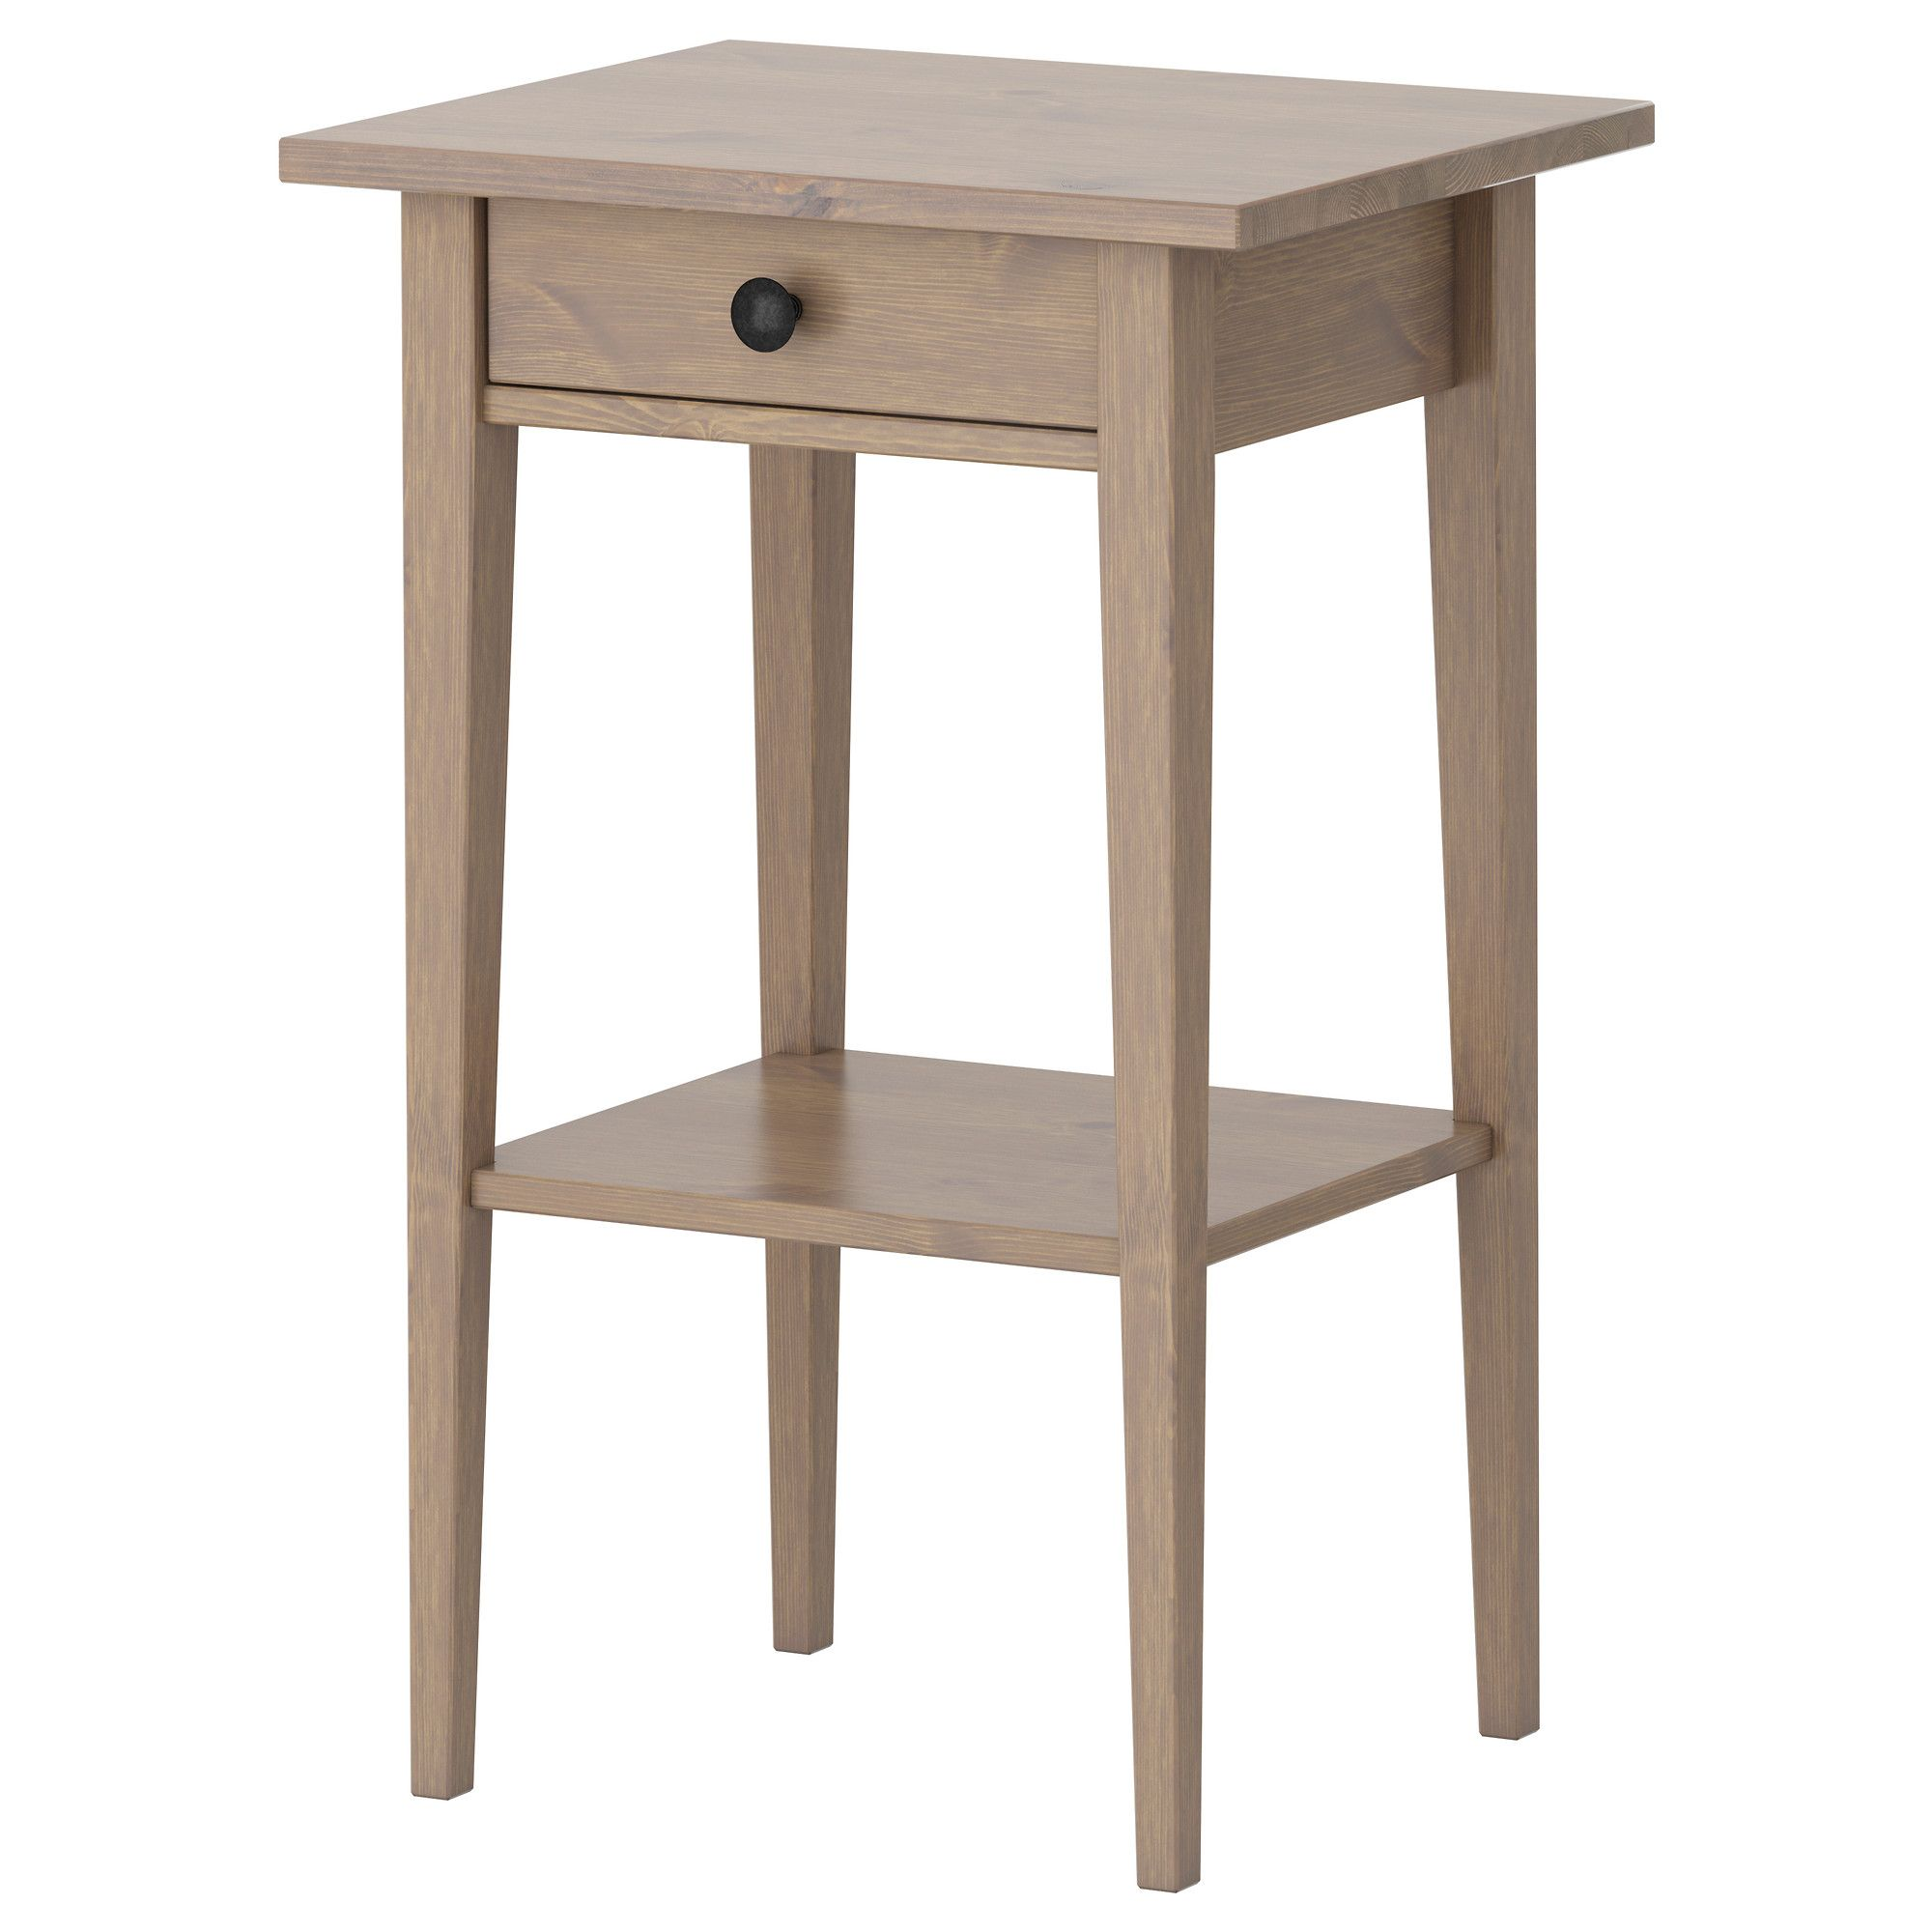 IKEA HEMNES BlackBrown Nightstand Hemnes nightstand